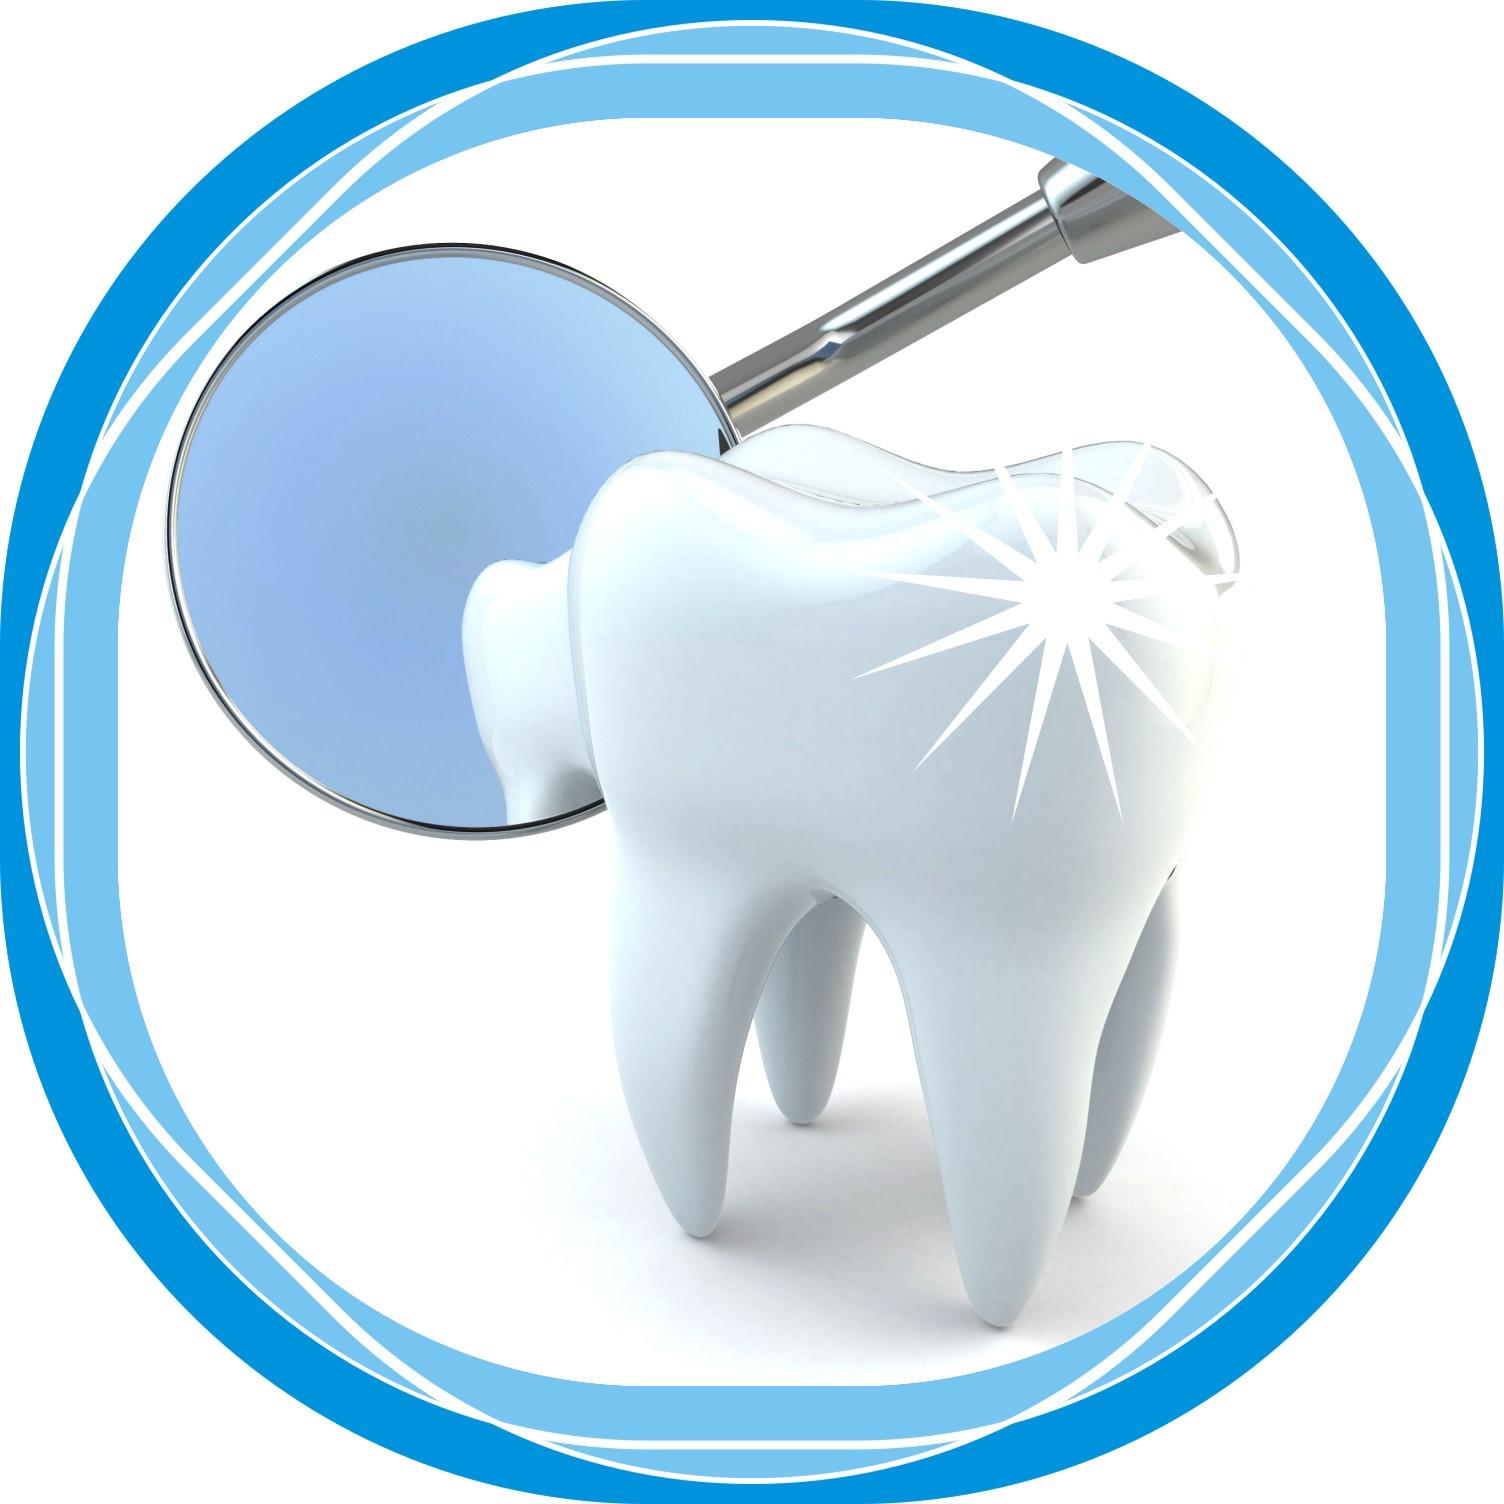 доступ рисунок на визитку стоматолога ошибок